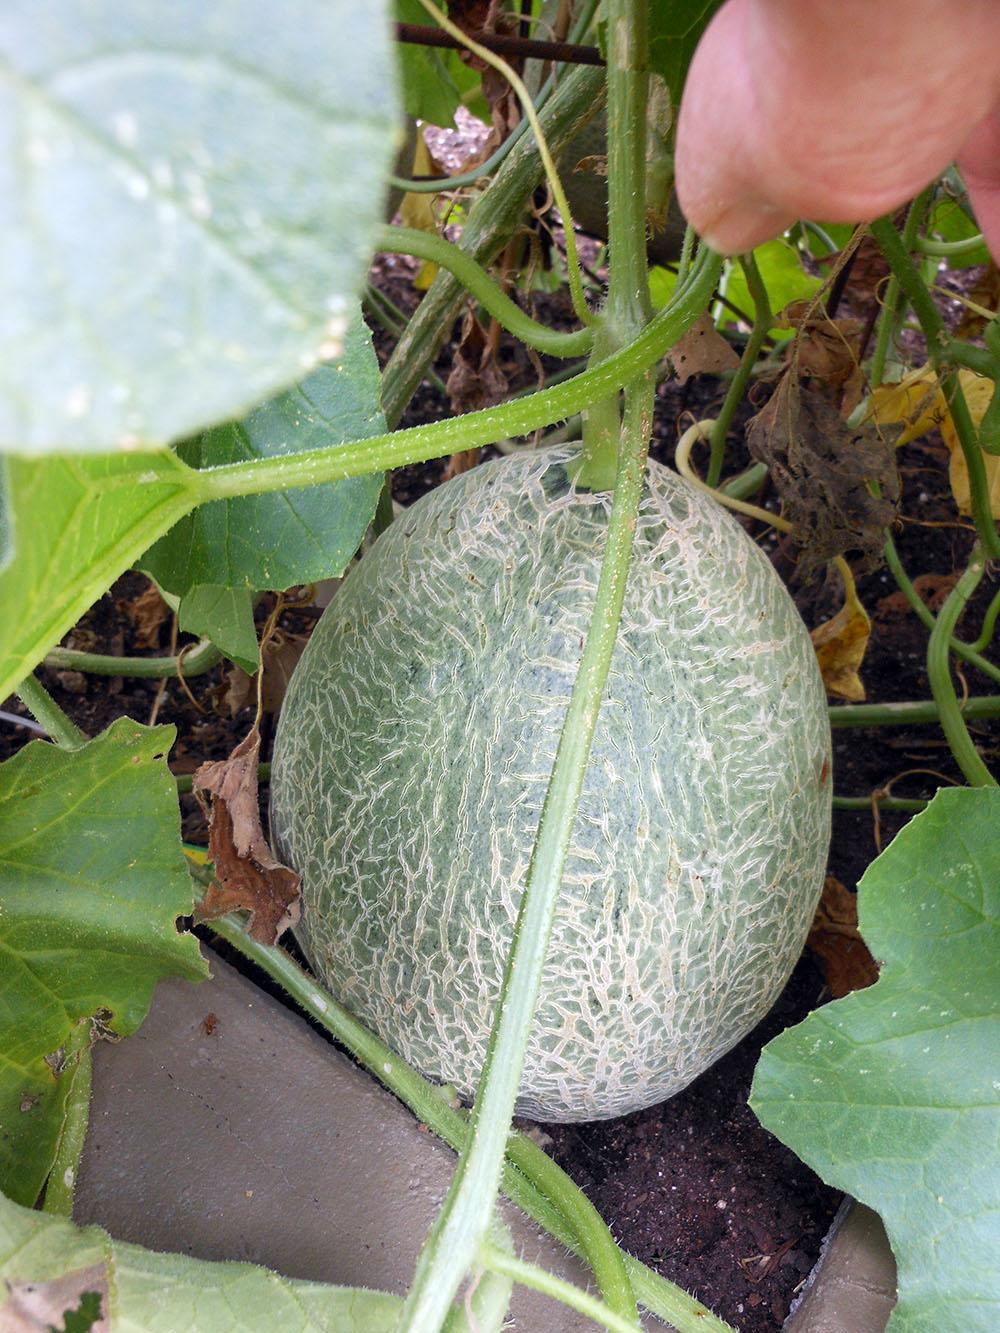 08-04-2016 Cantaloupe Plant 10